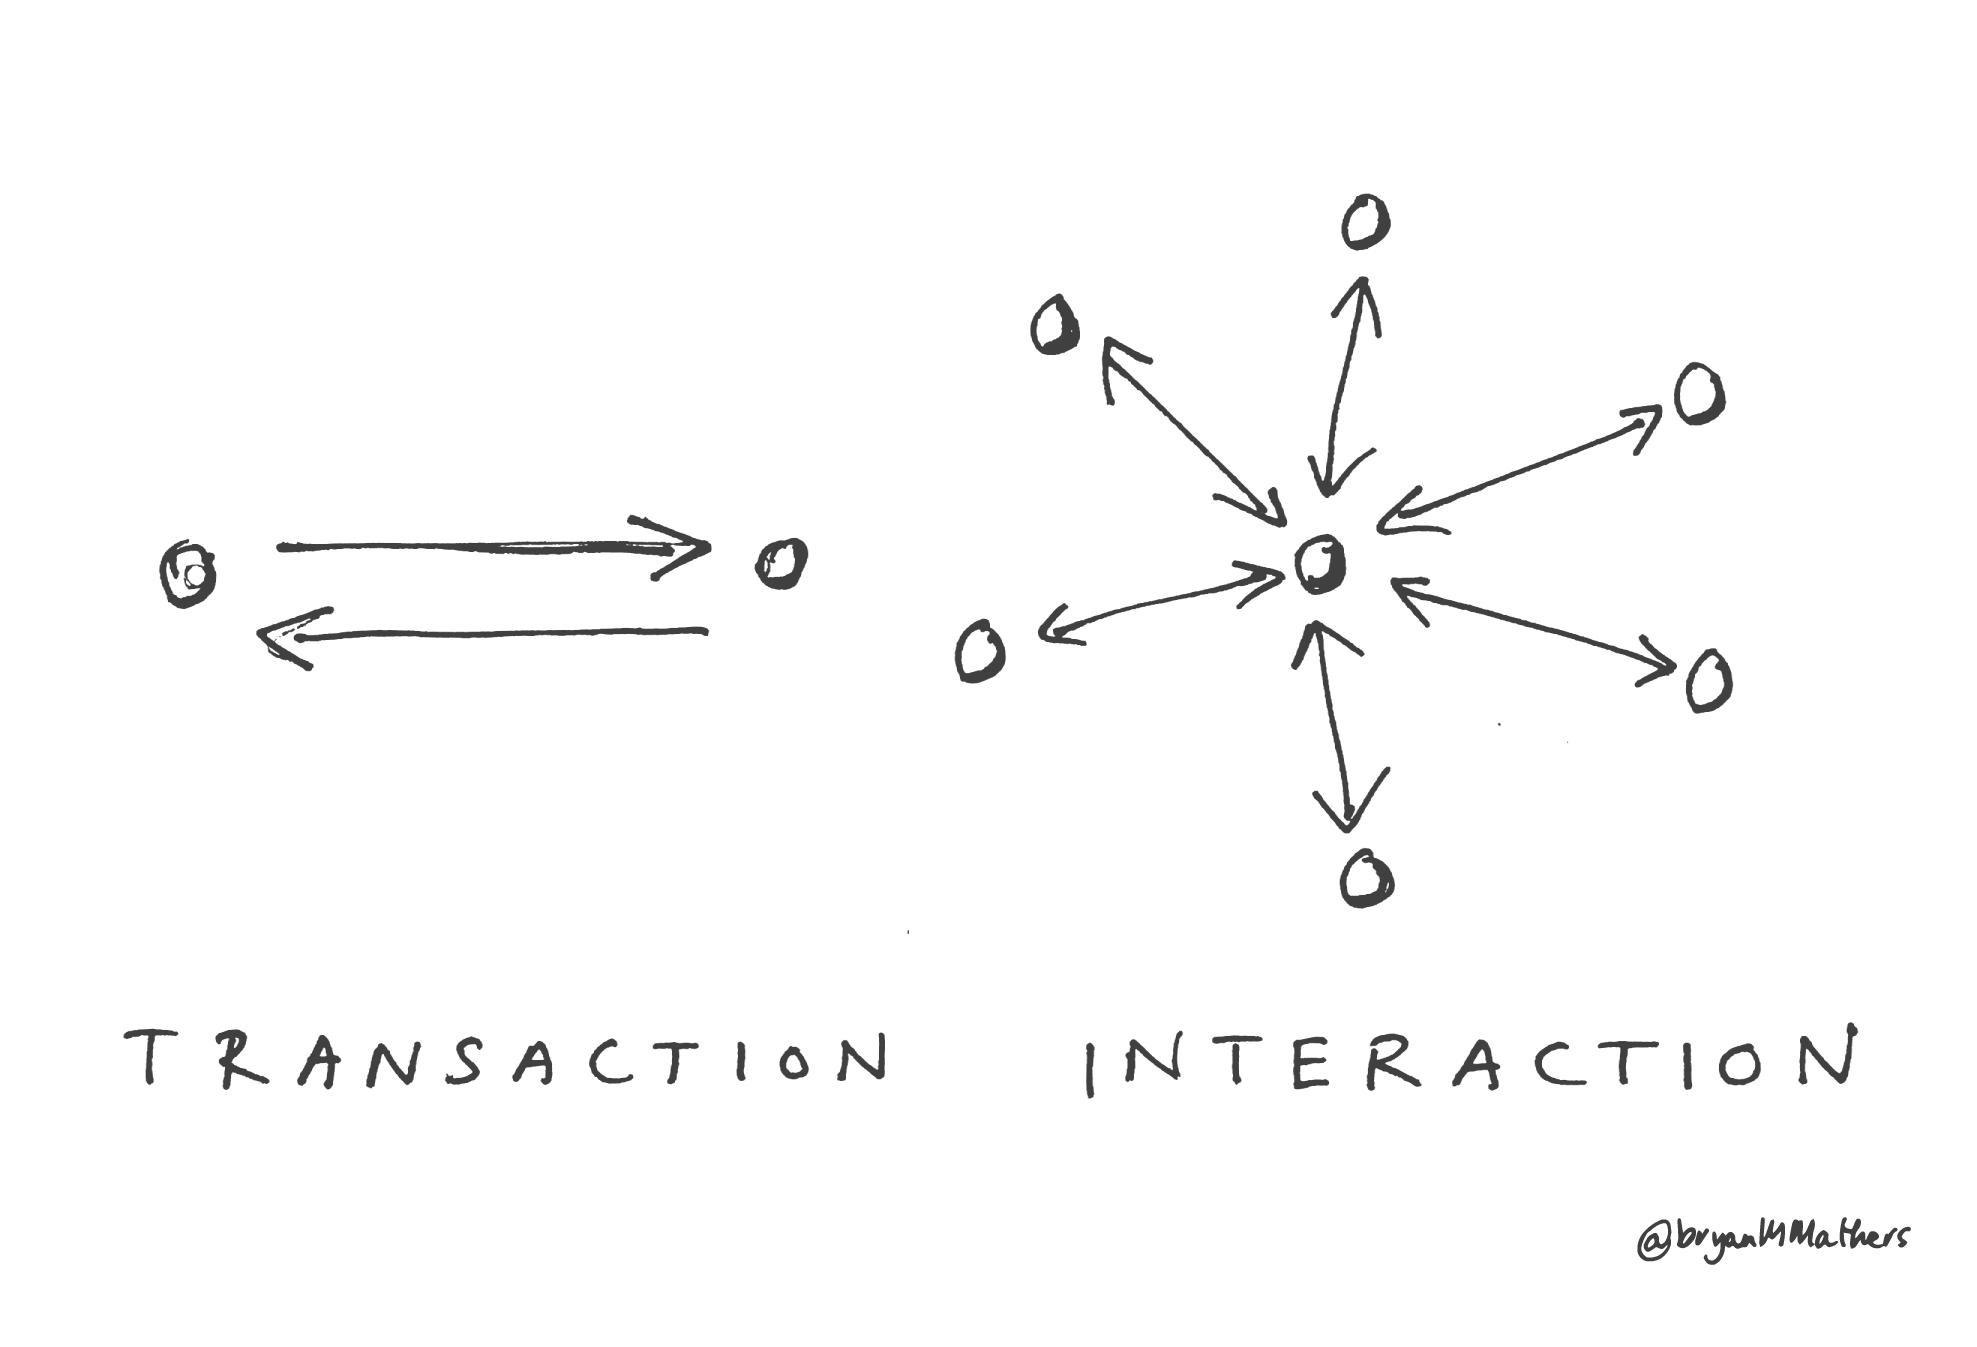 Transaction & Interaction